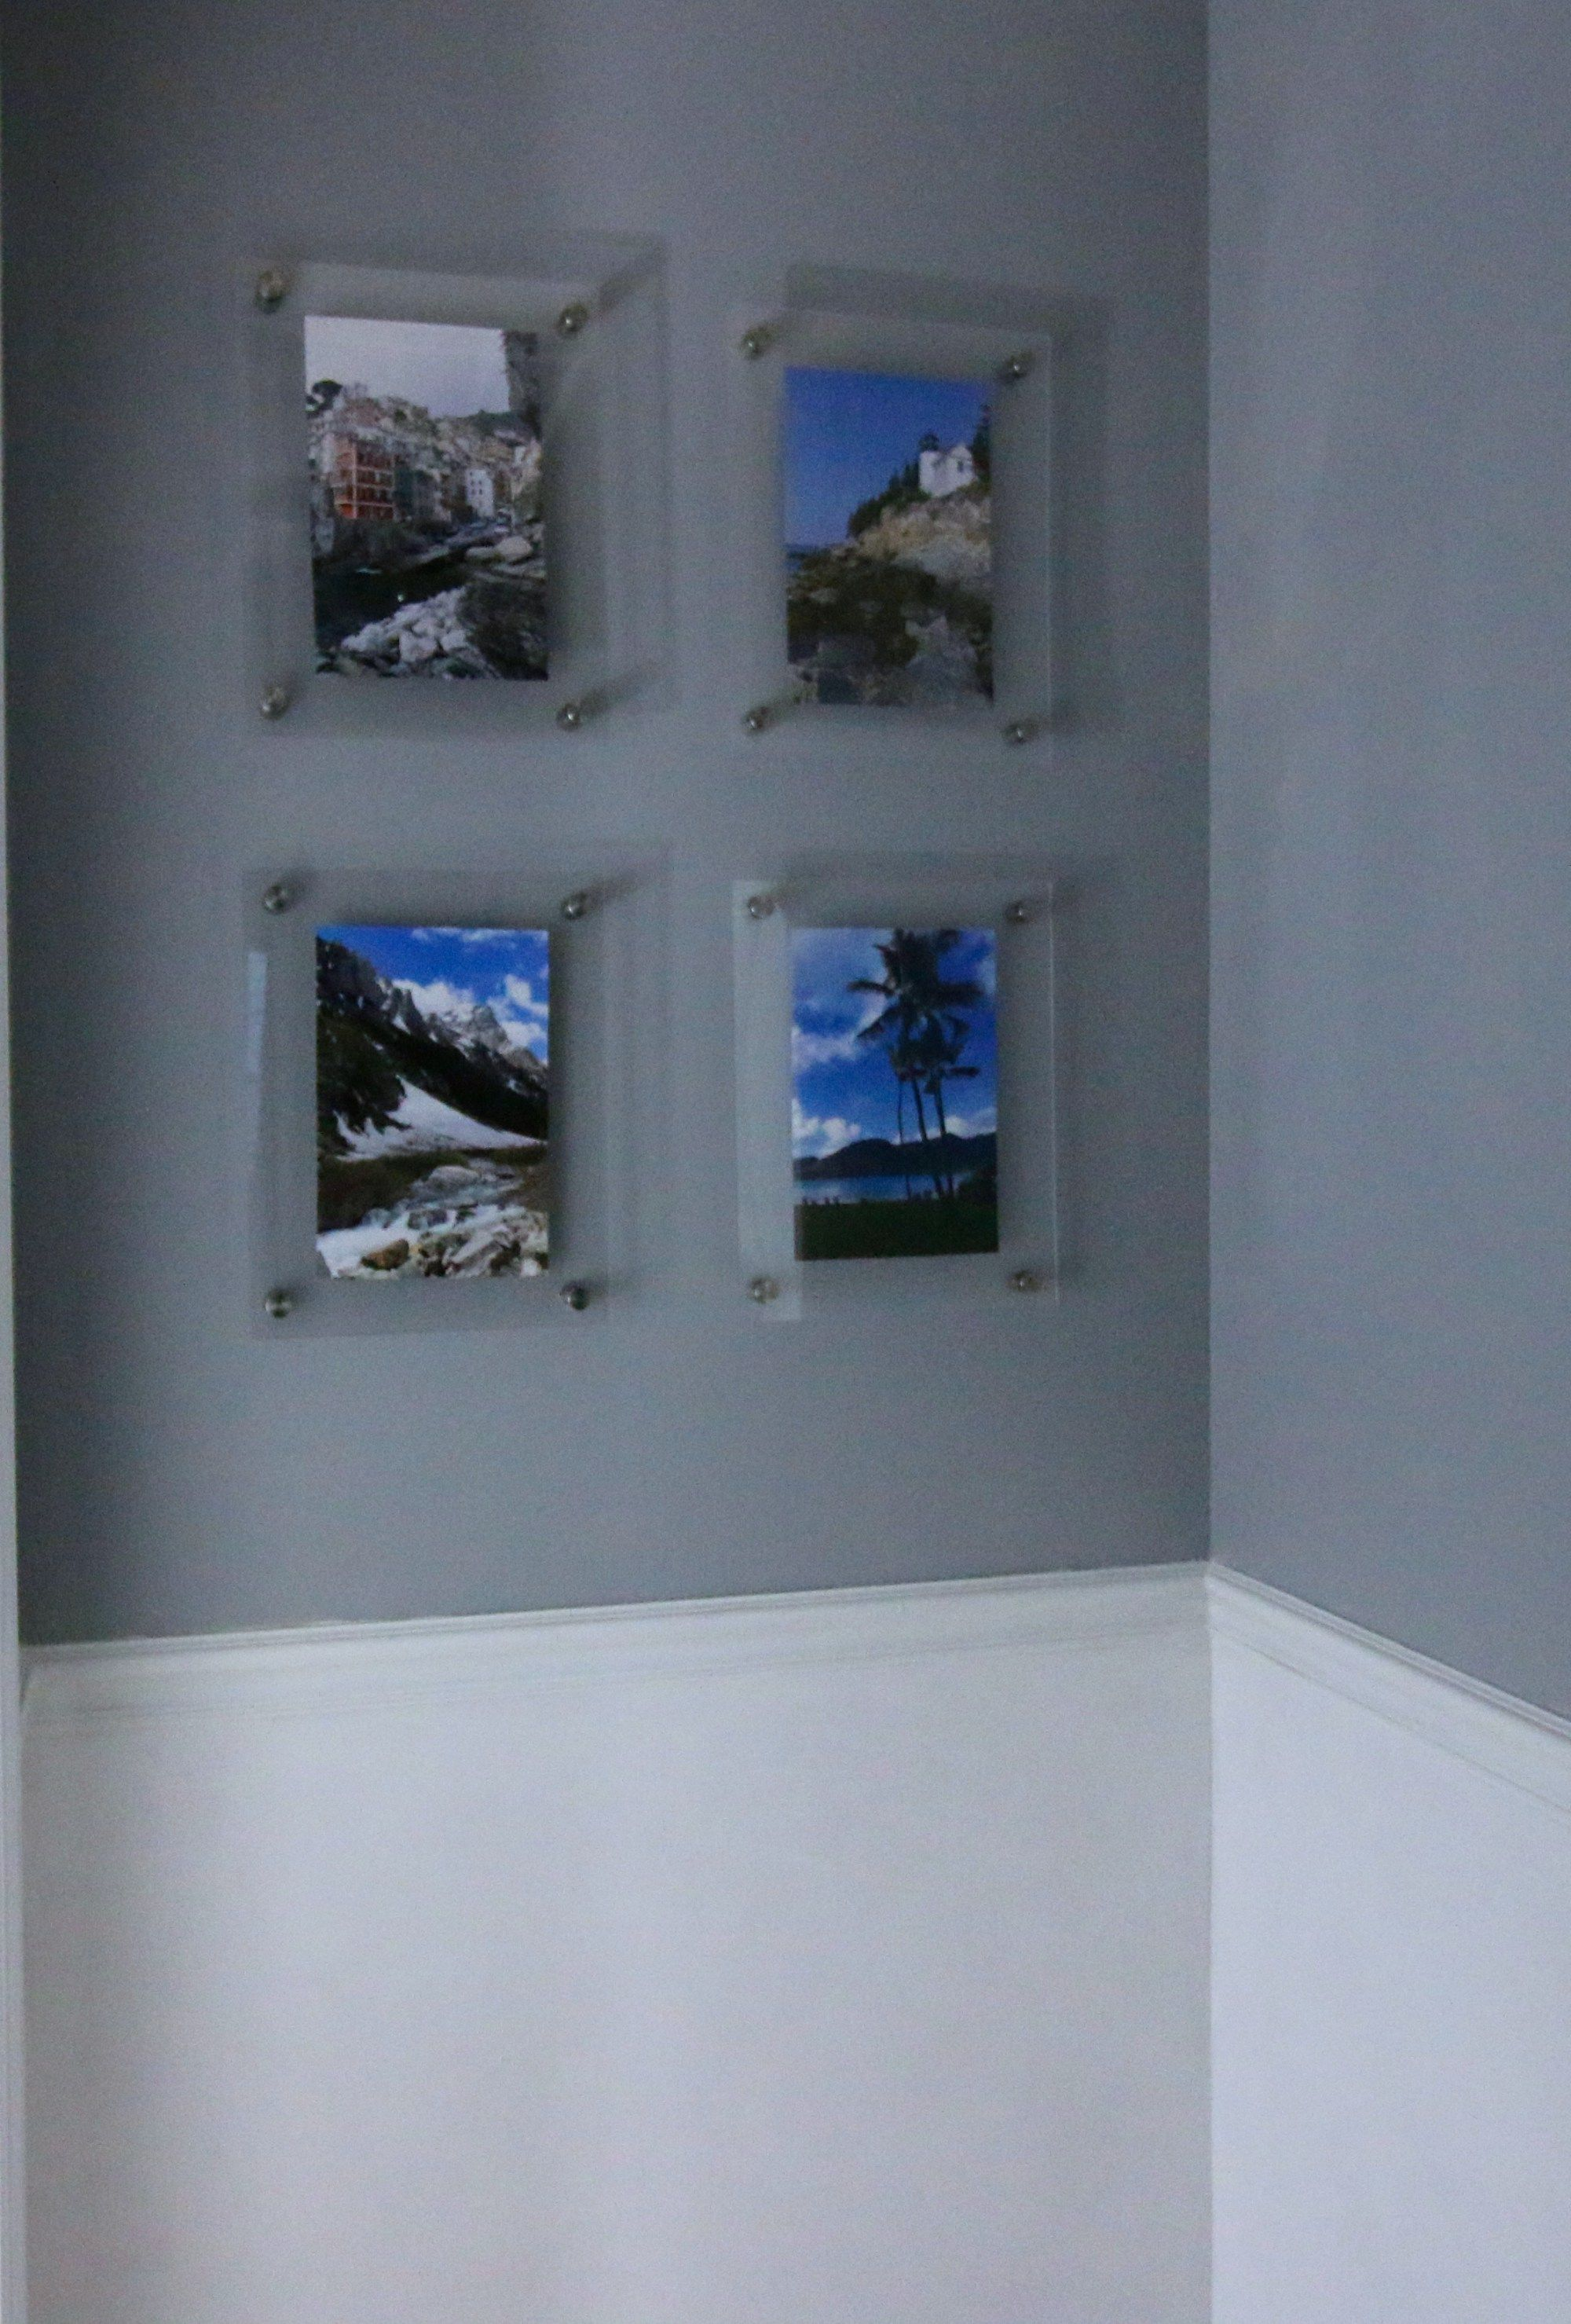 Diy Knock Off Wall Mounted Acrylic Frame Gallery Wall Gallery Wall Frames Frame Wall Decor Gallery Wall